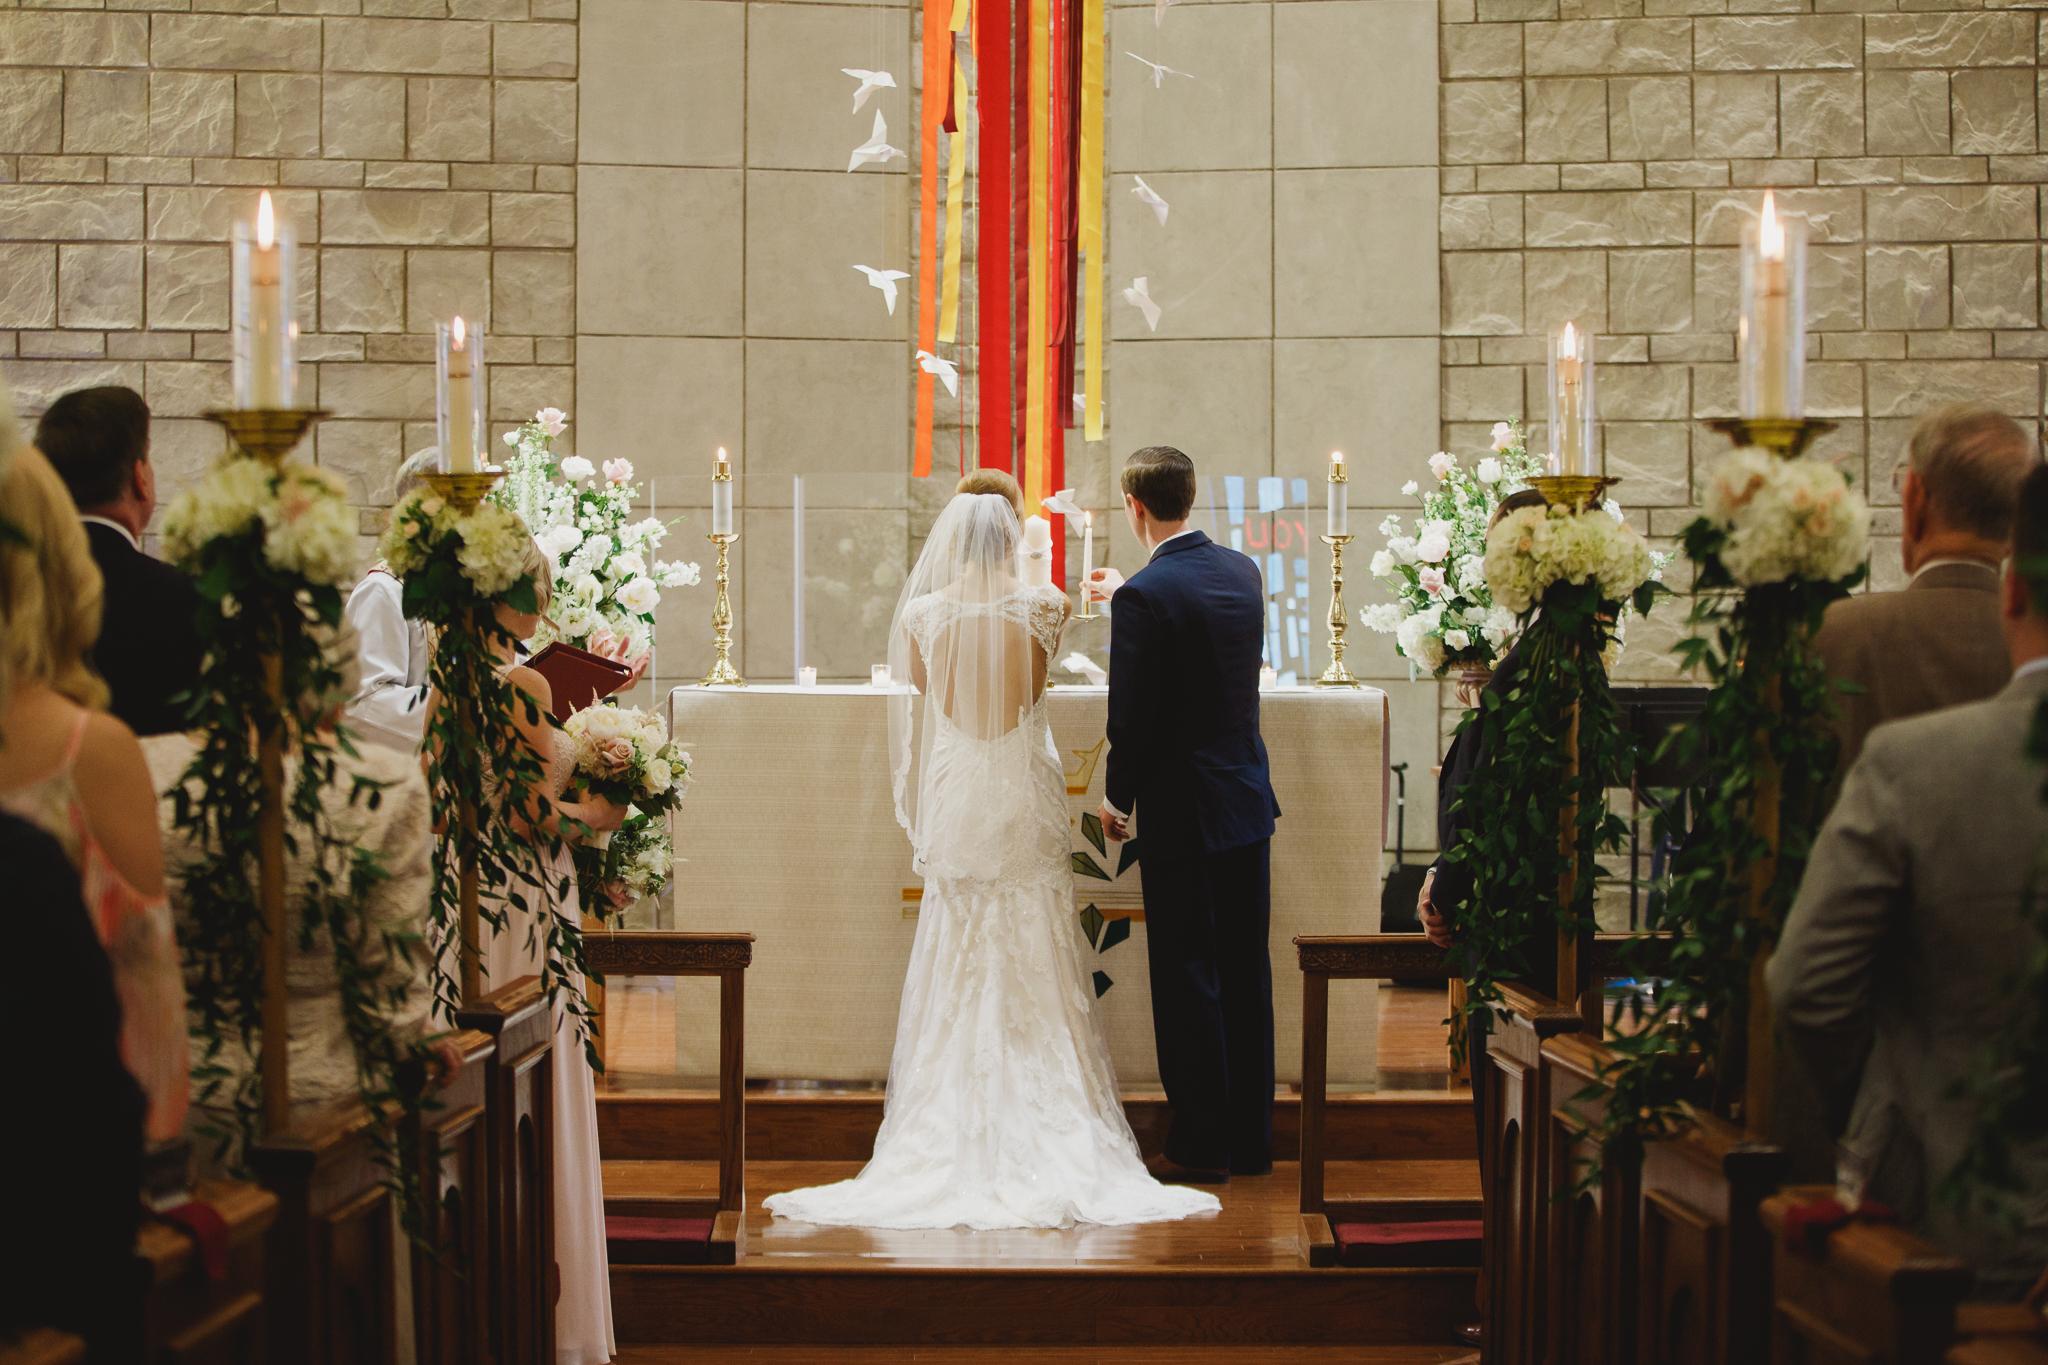 Michael and Kelly - the ashton depot - wedding DFW - wedding photographer- elizalde photography (48 of 150).jpg